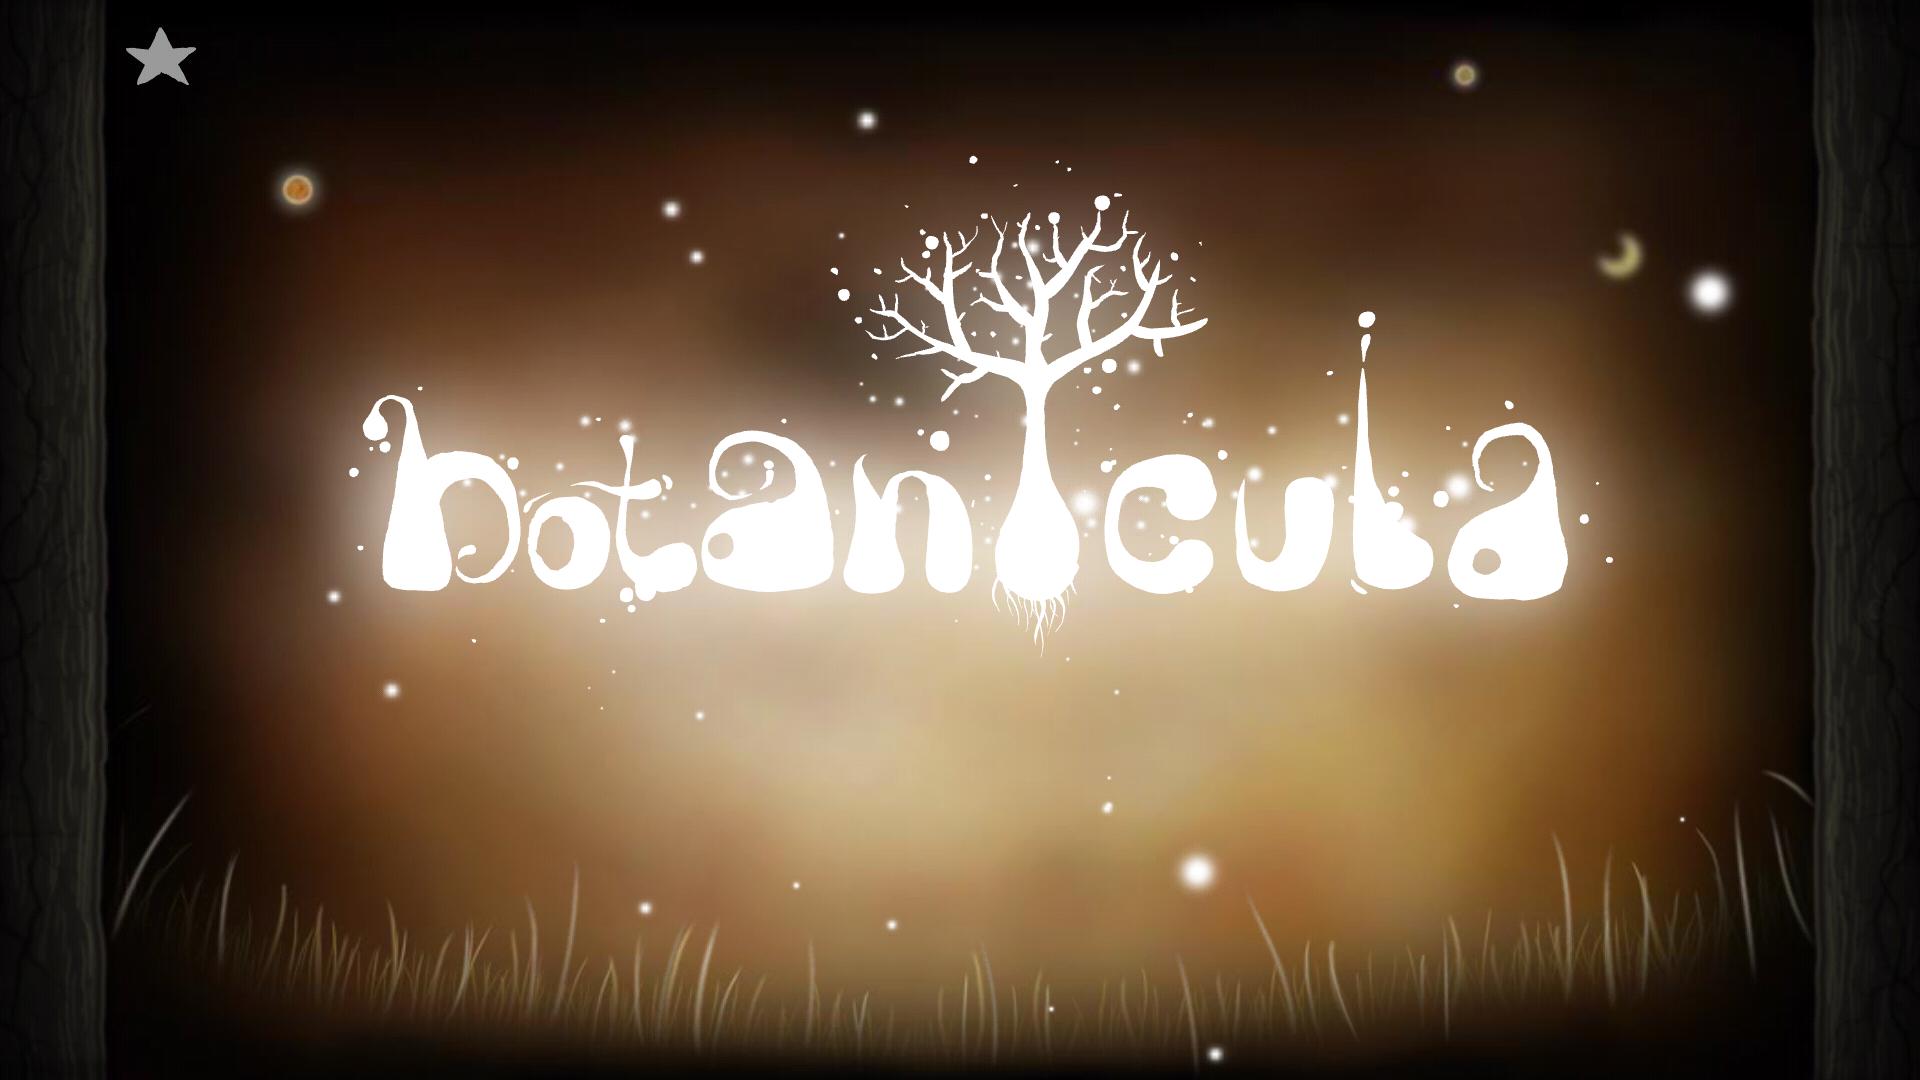 Botanicula-1